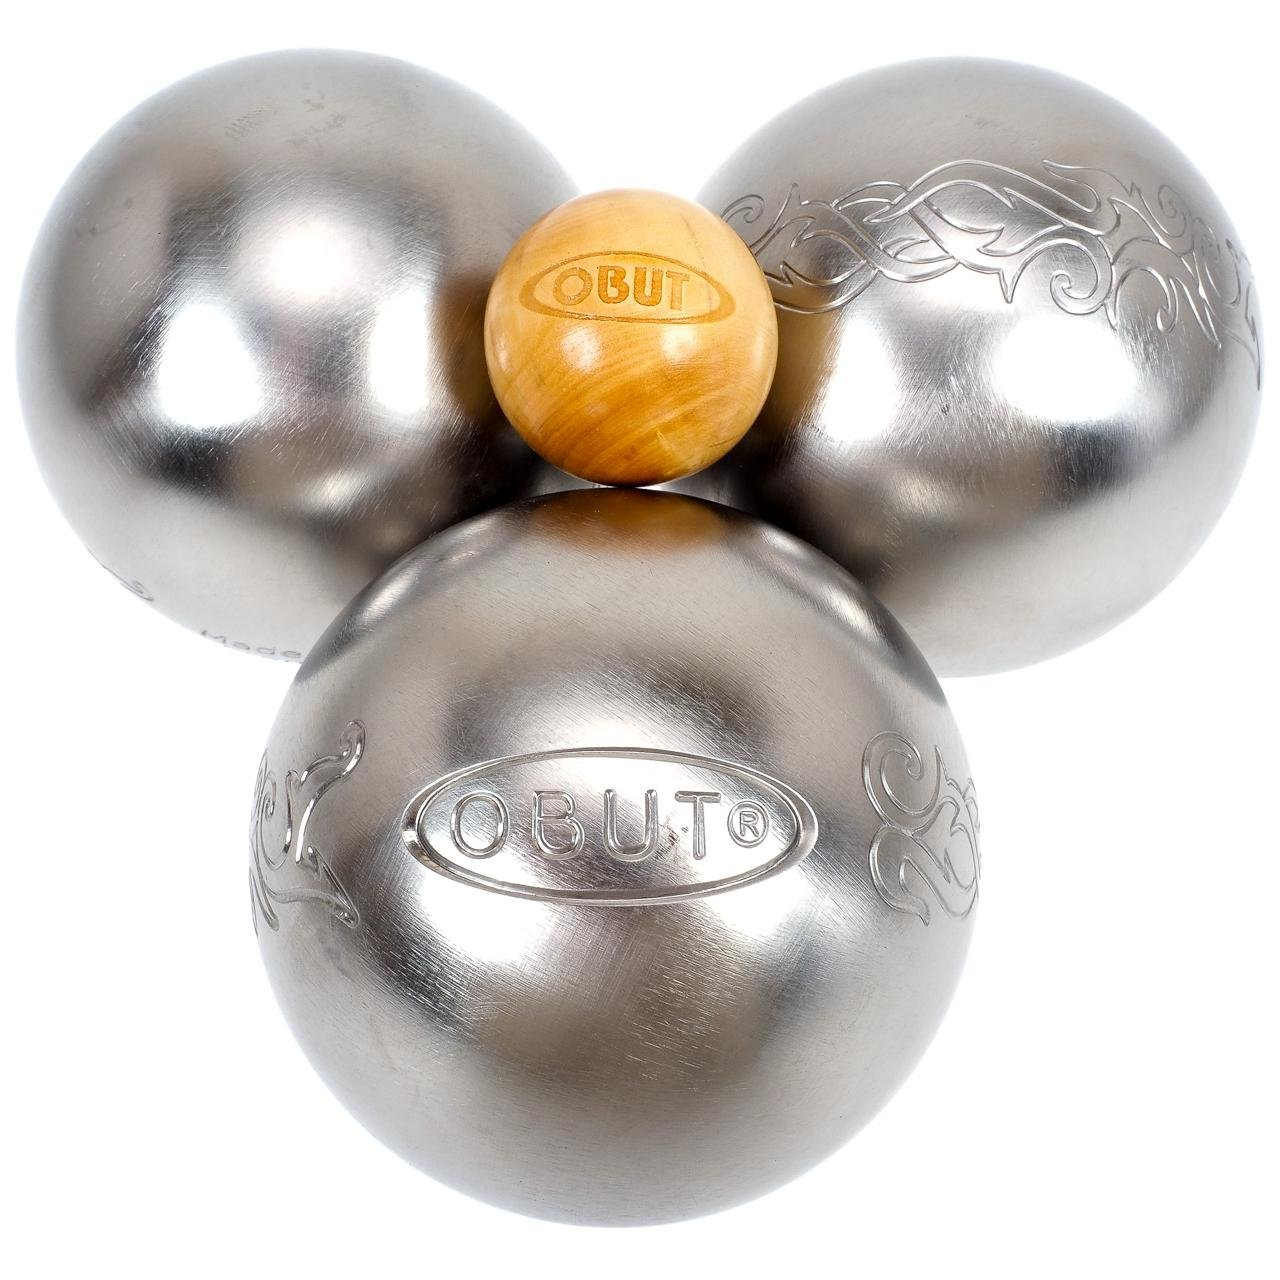 Set of 3/Balls Obut Leisure Stainless Steel Tatou